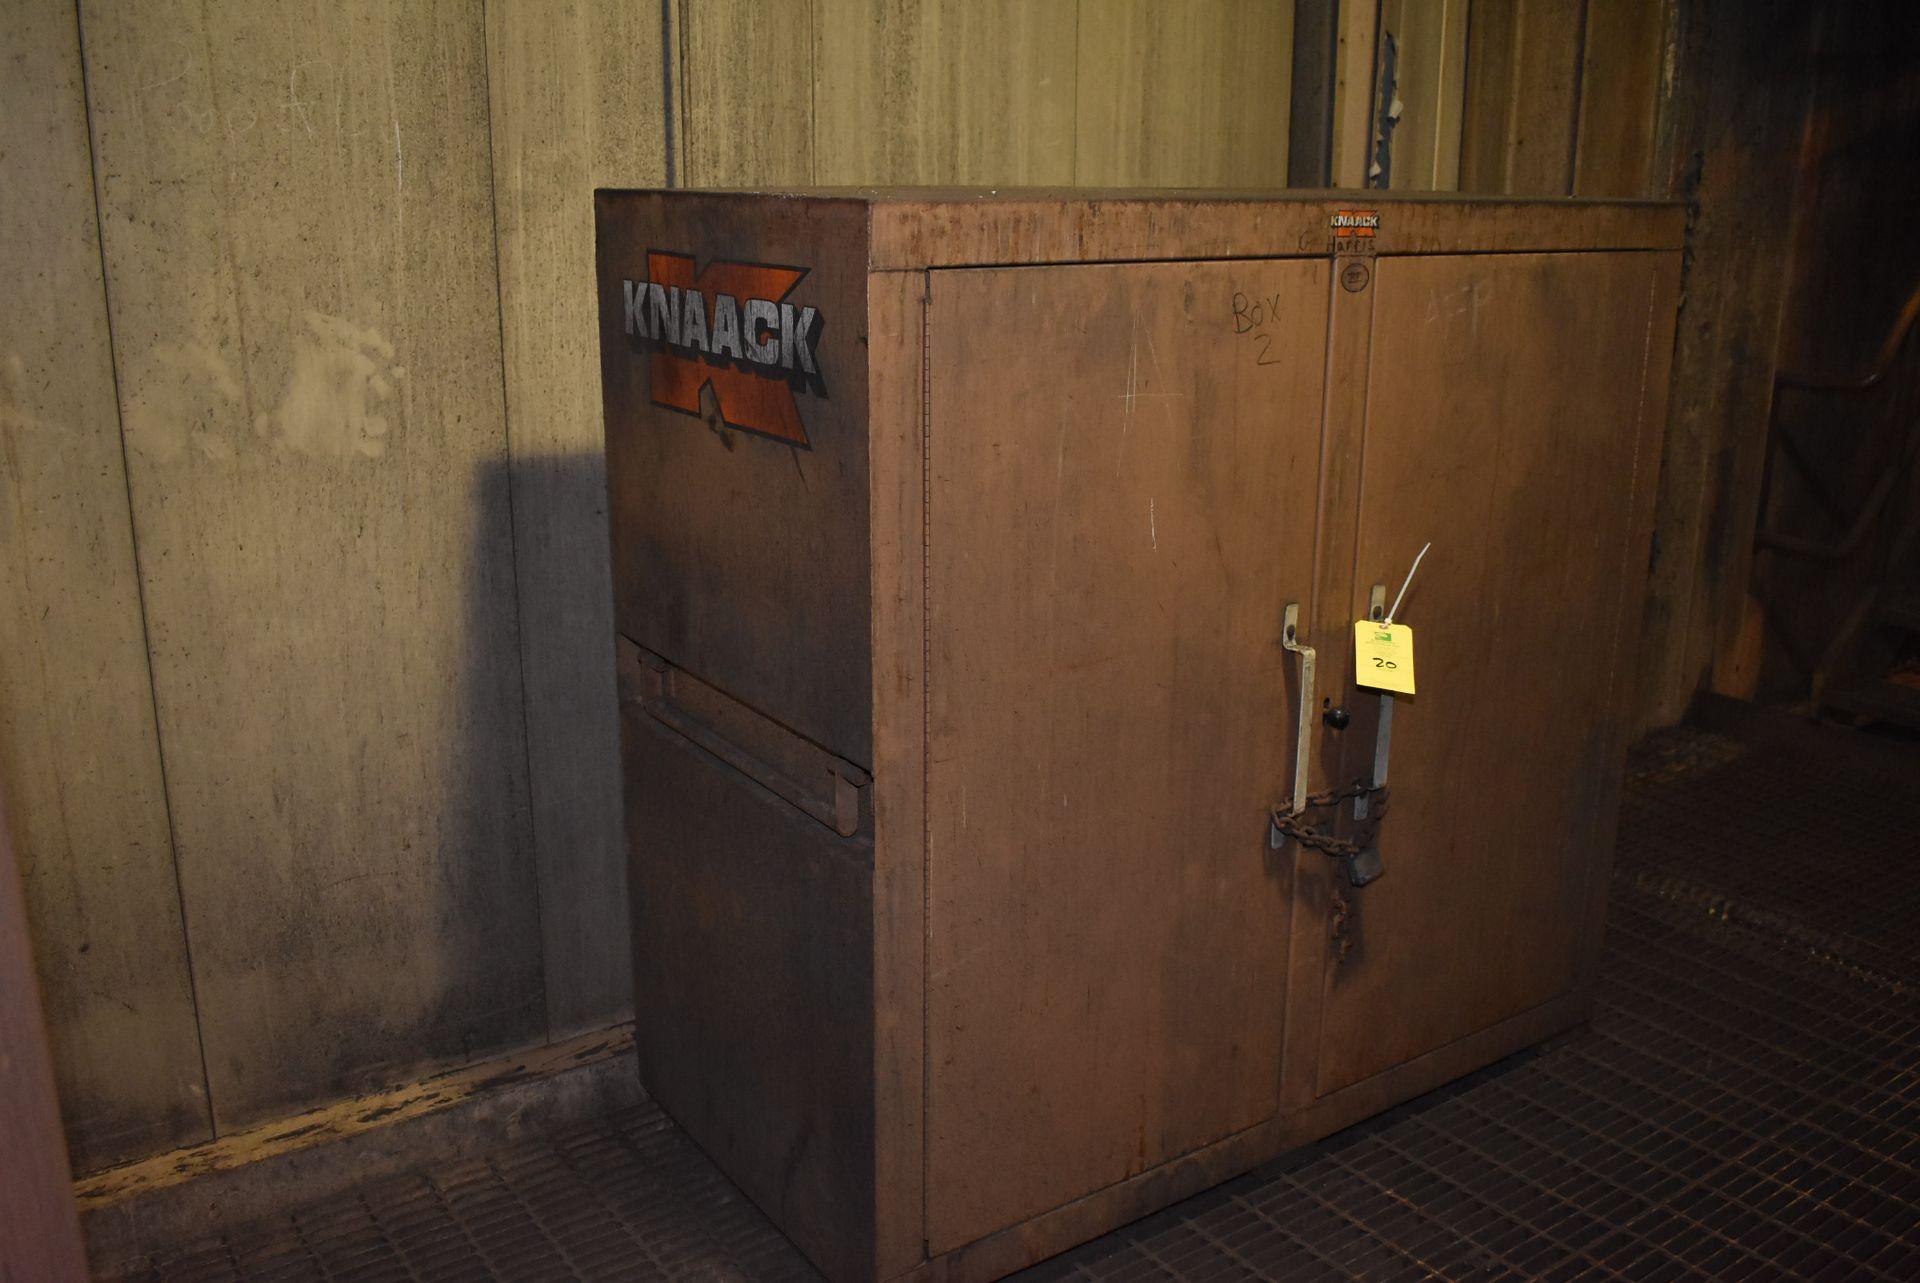 Lot 20 - Knaack Job Master 99 Job Box